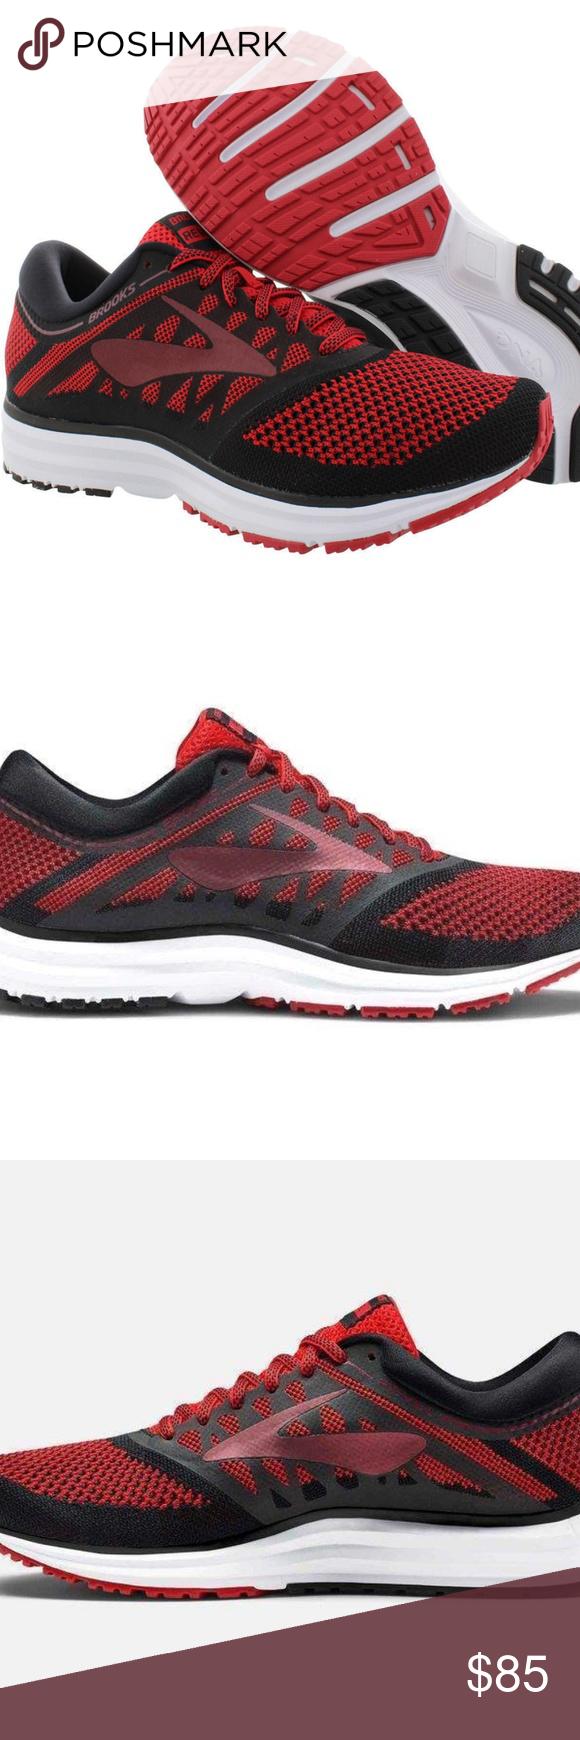 ce9d763617e Brooks Revel Running Shoes Men s Sizes NEW Brooks Revel Red Black Running  Shoes Men s Sizes Color